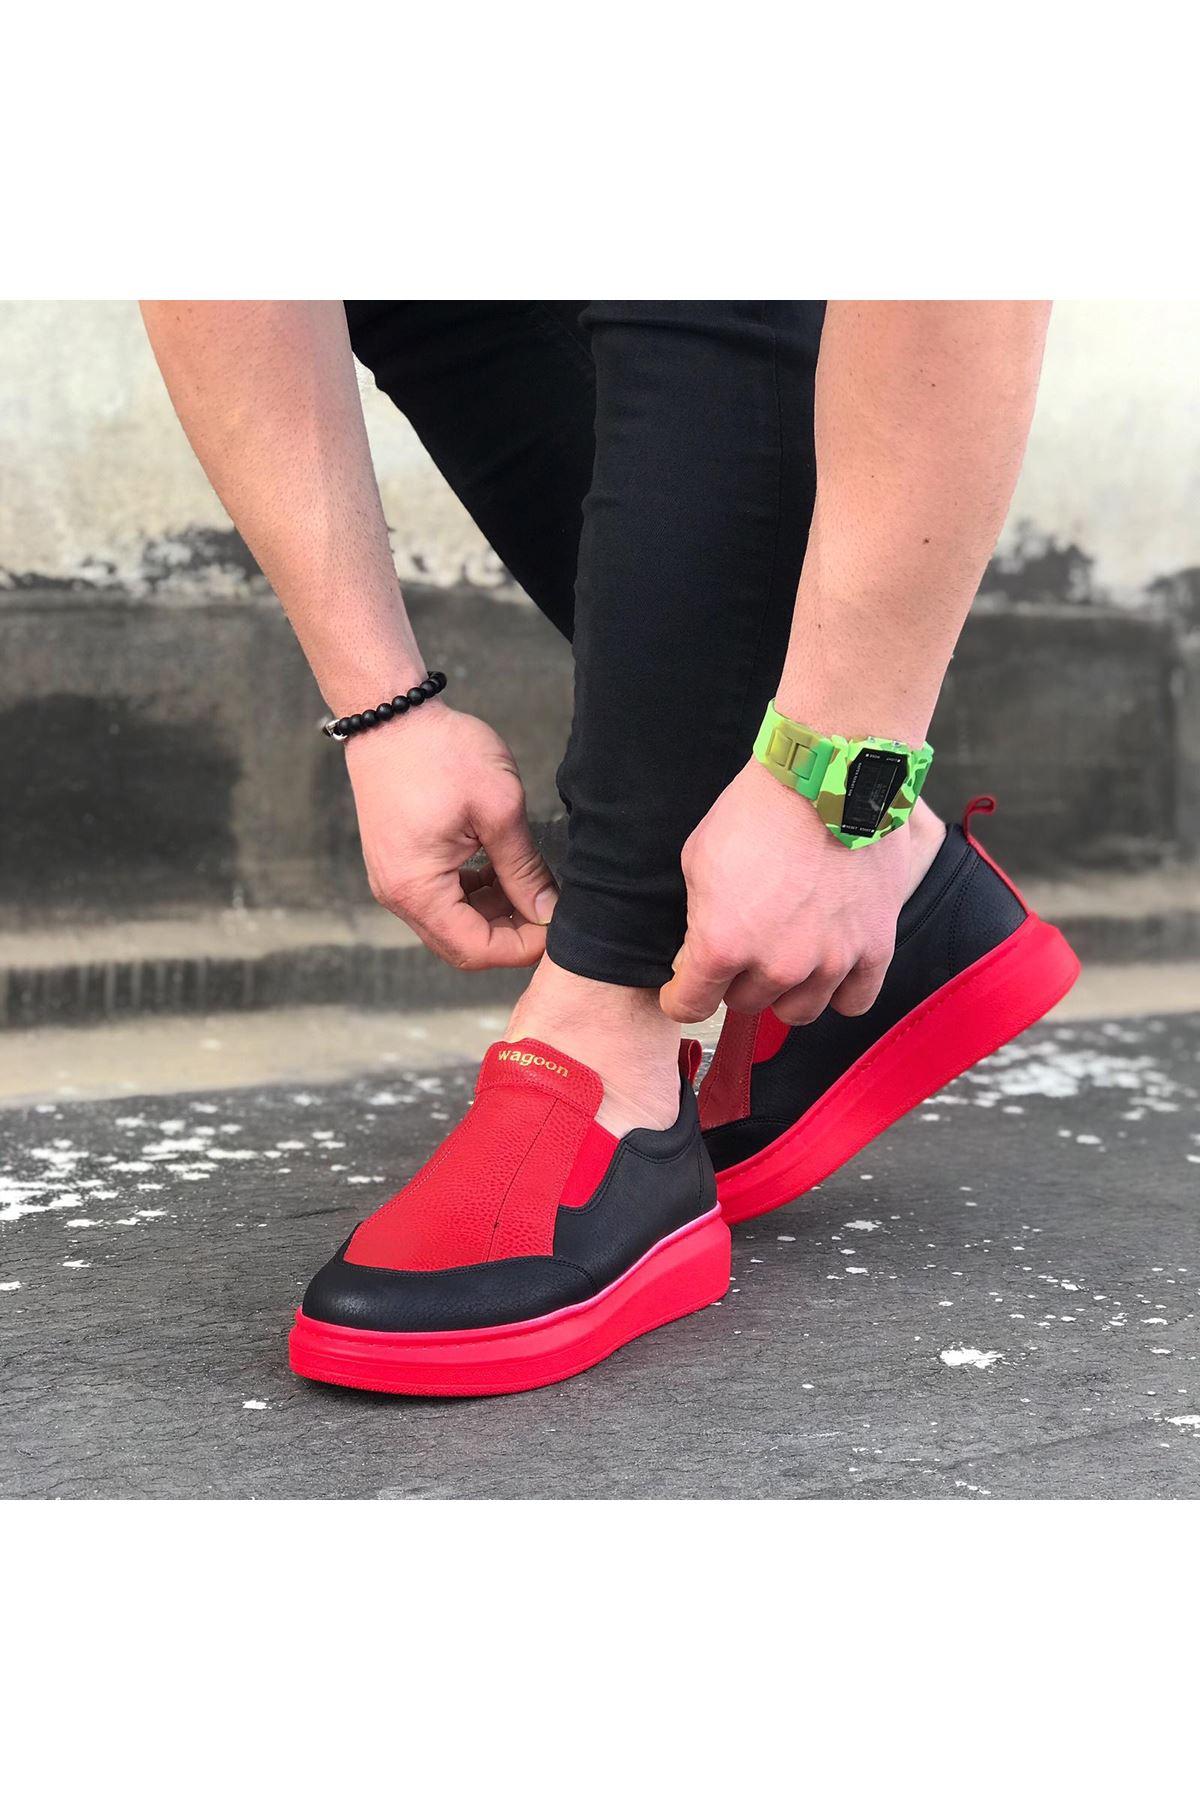 Wagoon WG049 Siyah Kırmızı Lastikli Taban Casual Erkek Ayakkabı